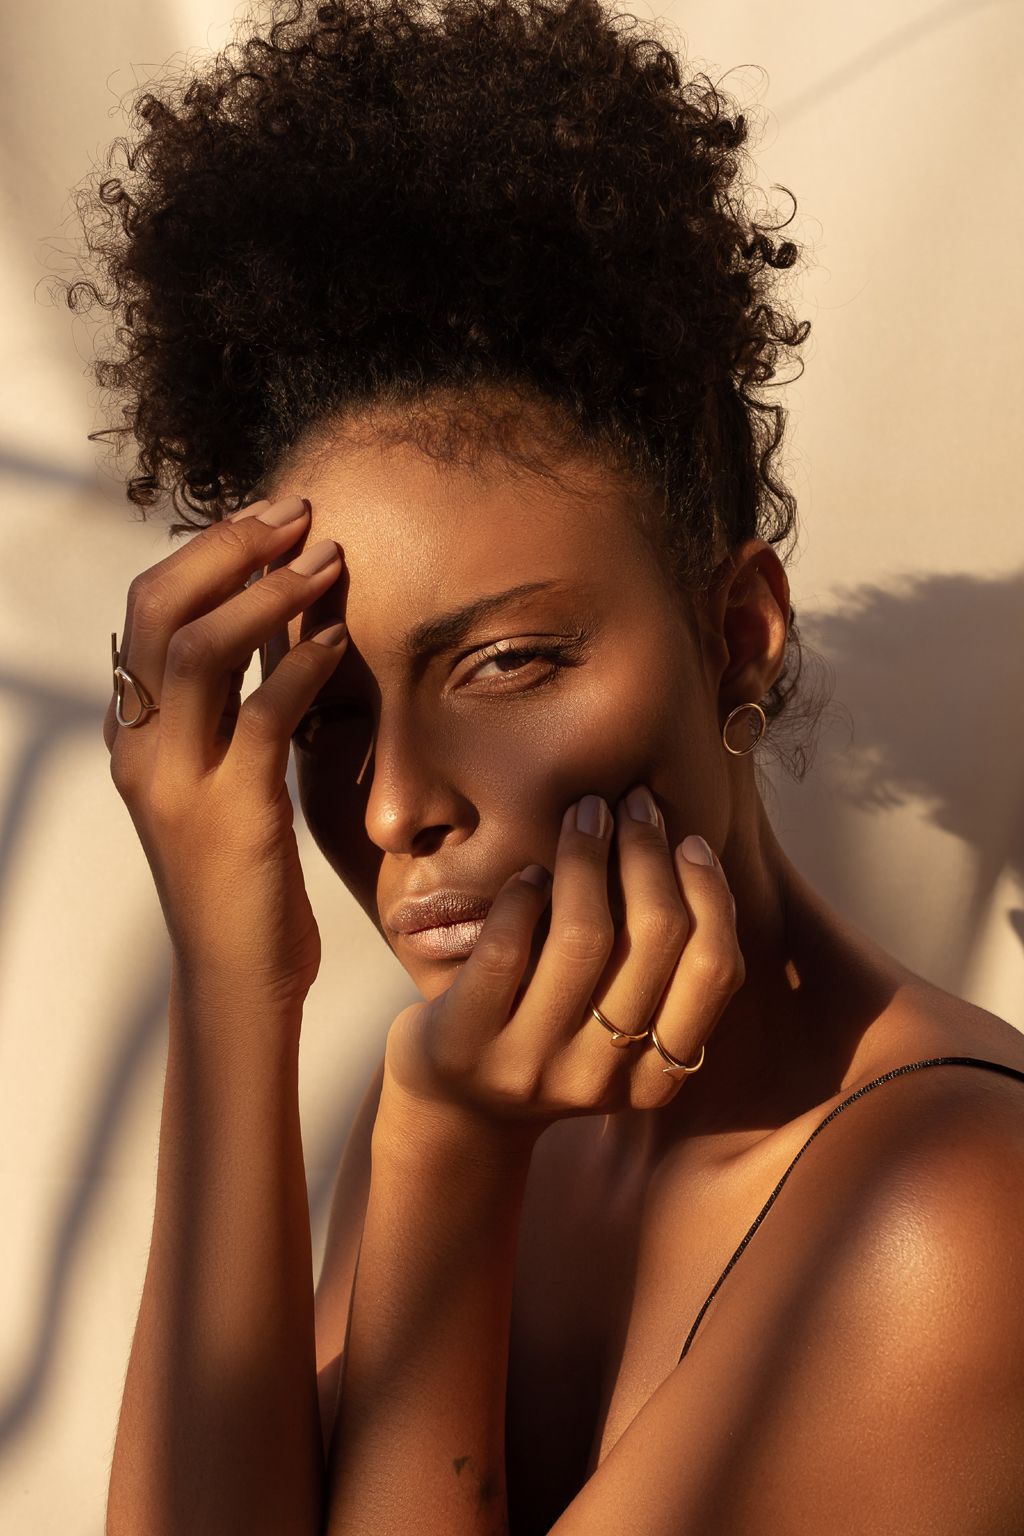 beauty tips confident beautiful woman in the sun dom aguiar unsplash